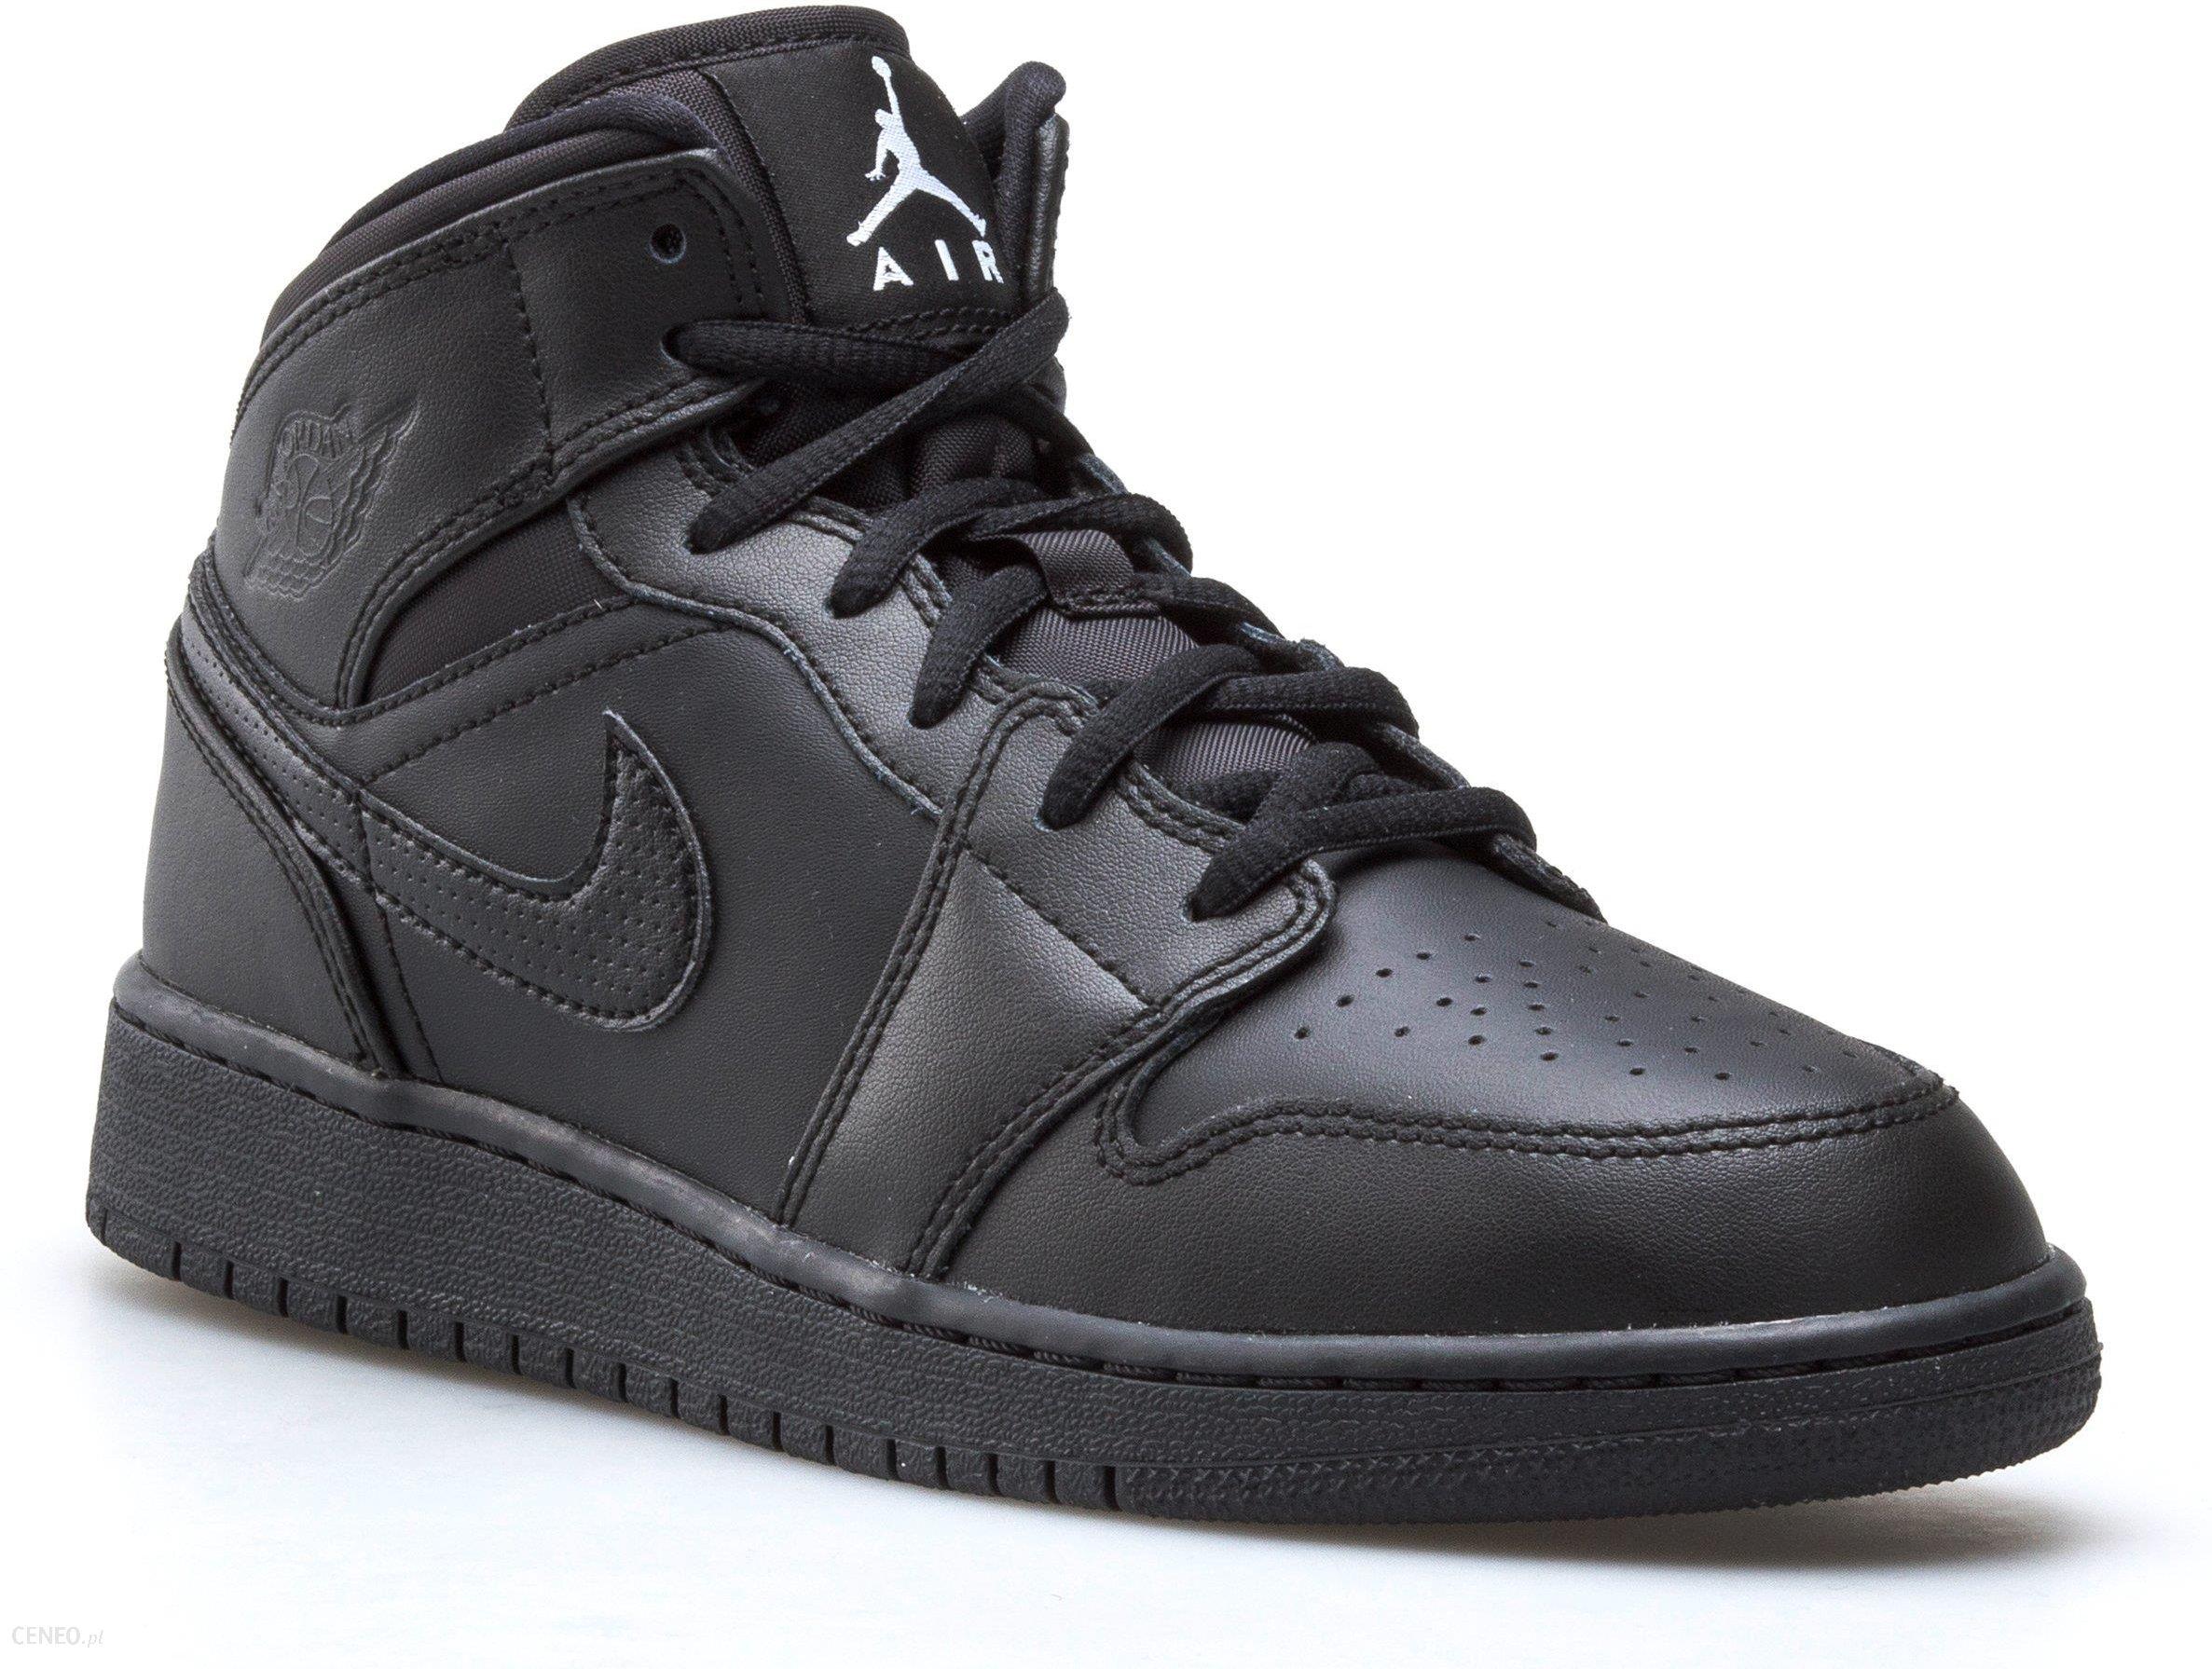 Buty Nike Damskie Air Jordan 1 MID Bg 554725 049 Ceny i opinie Ceneo.pl